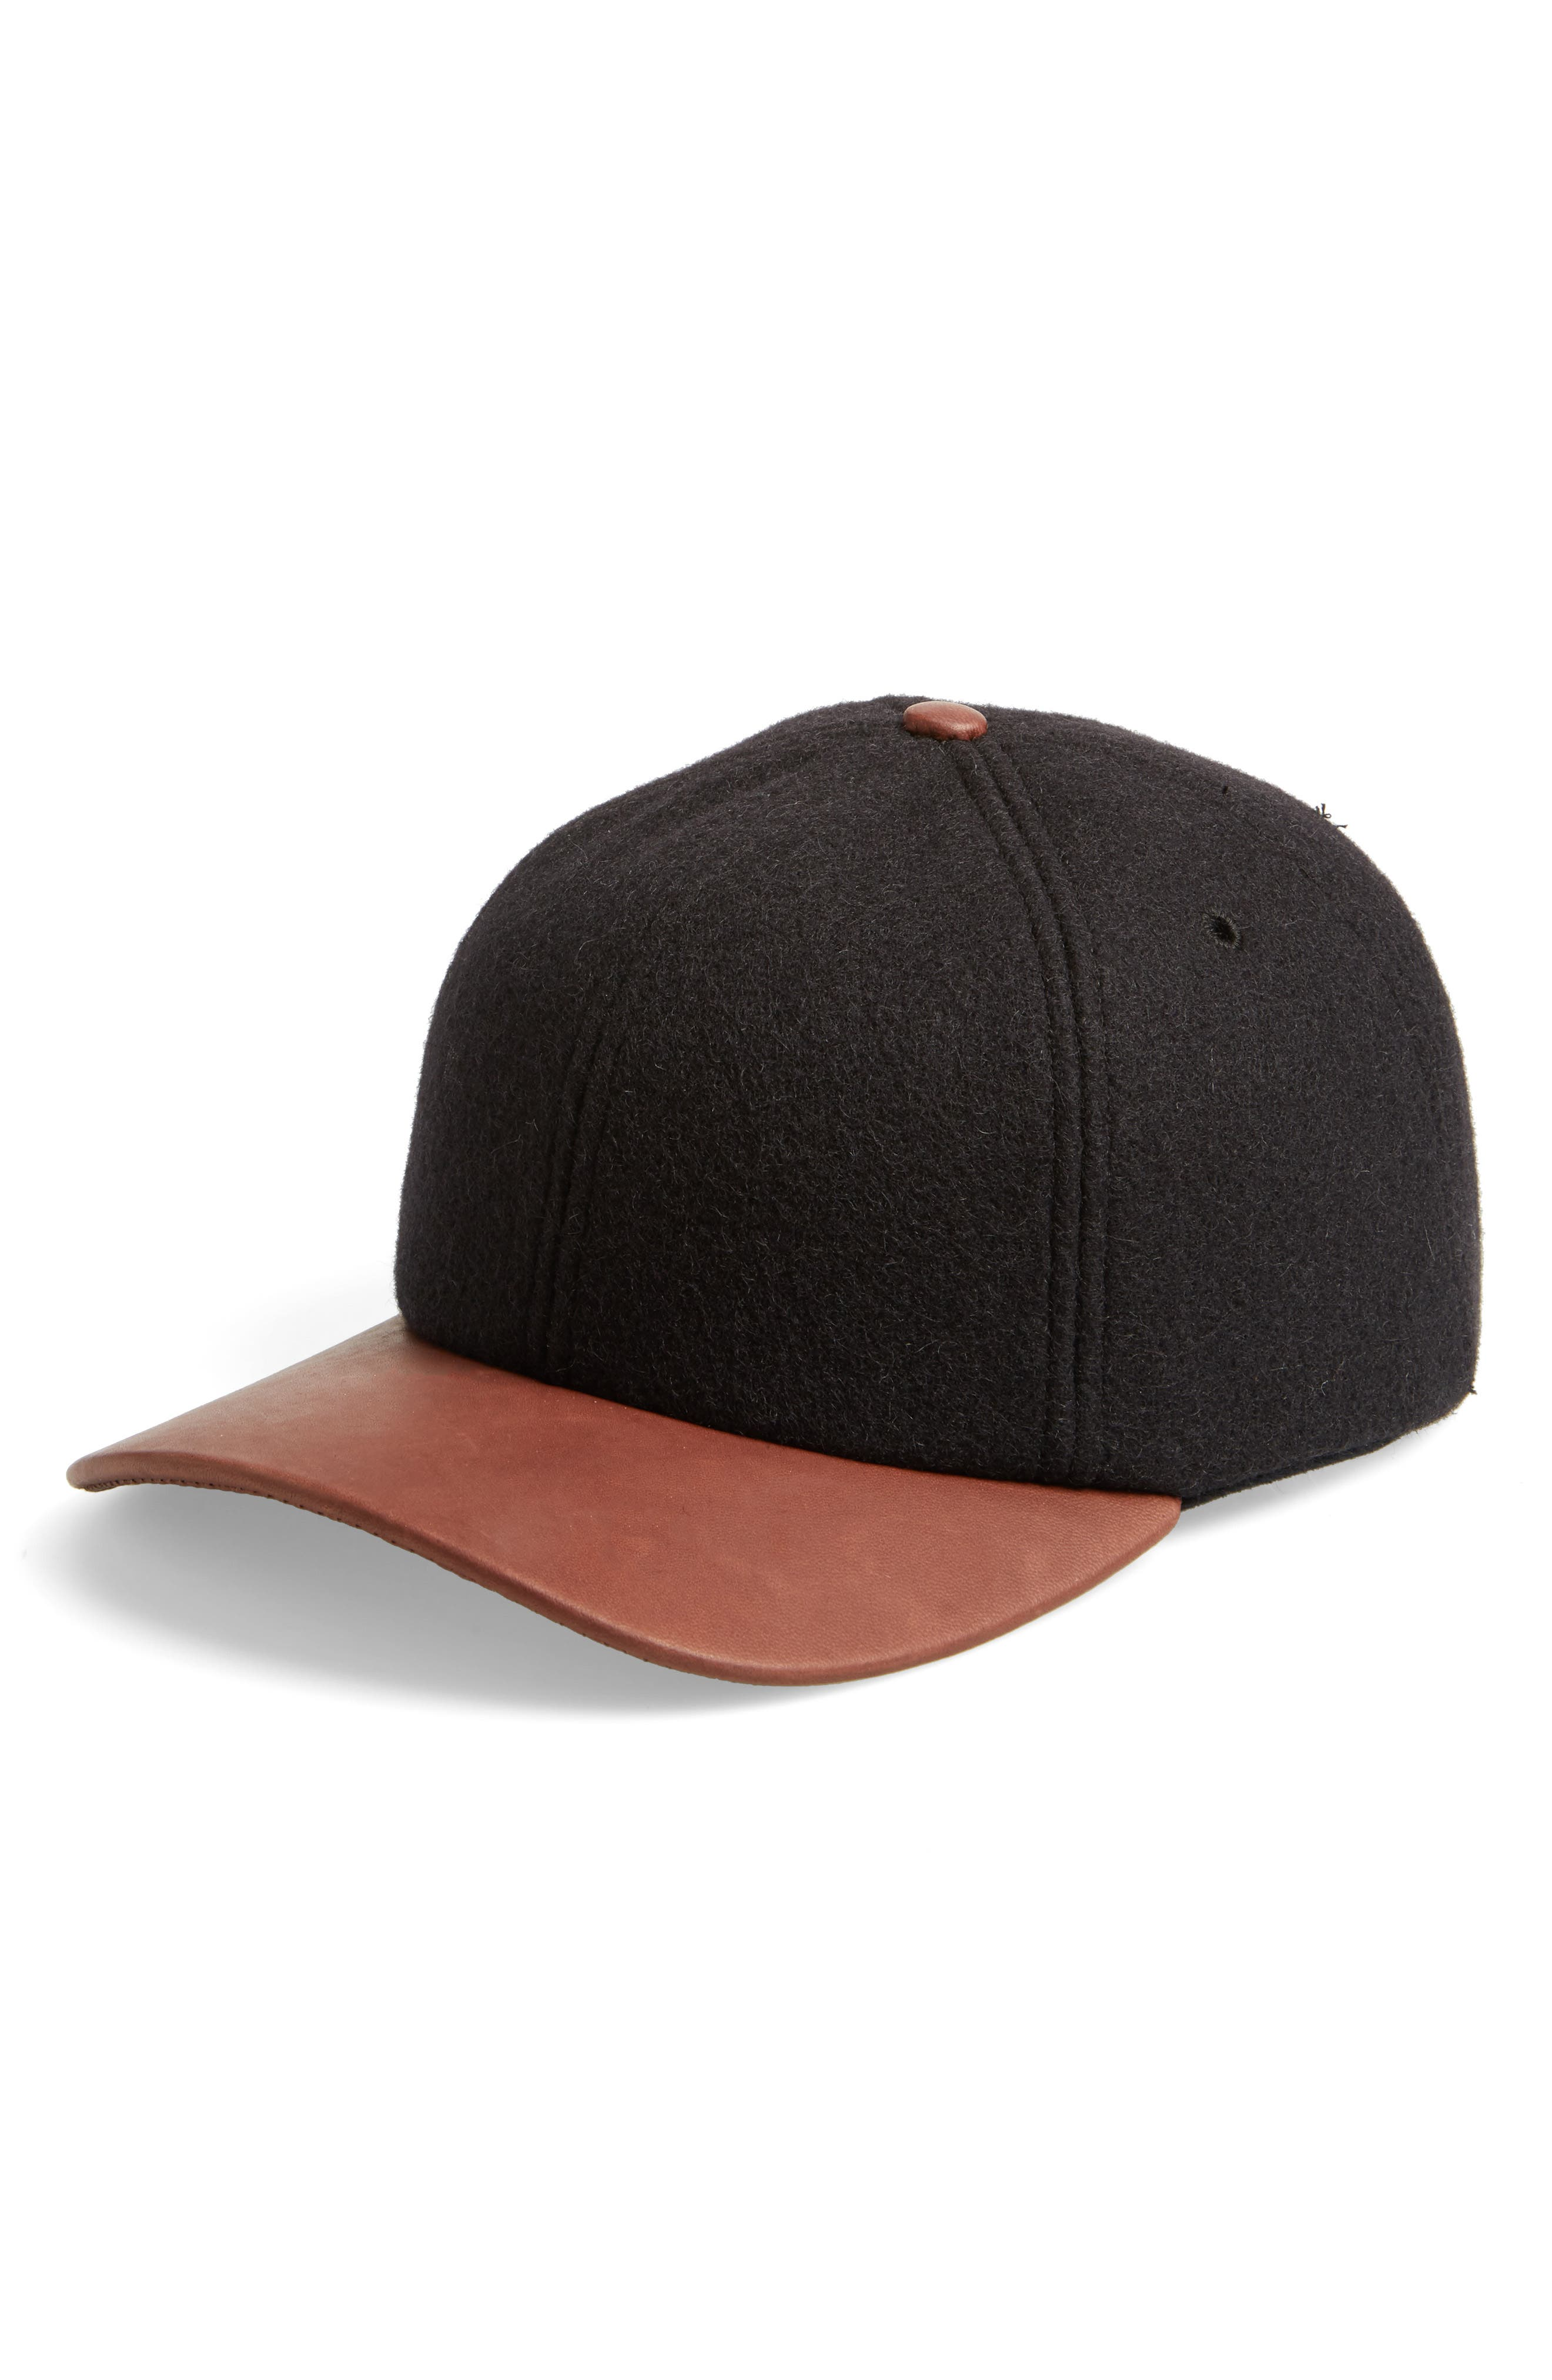 Melton Wool Blend Baseball Cap,                         Main,                         color, Black